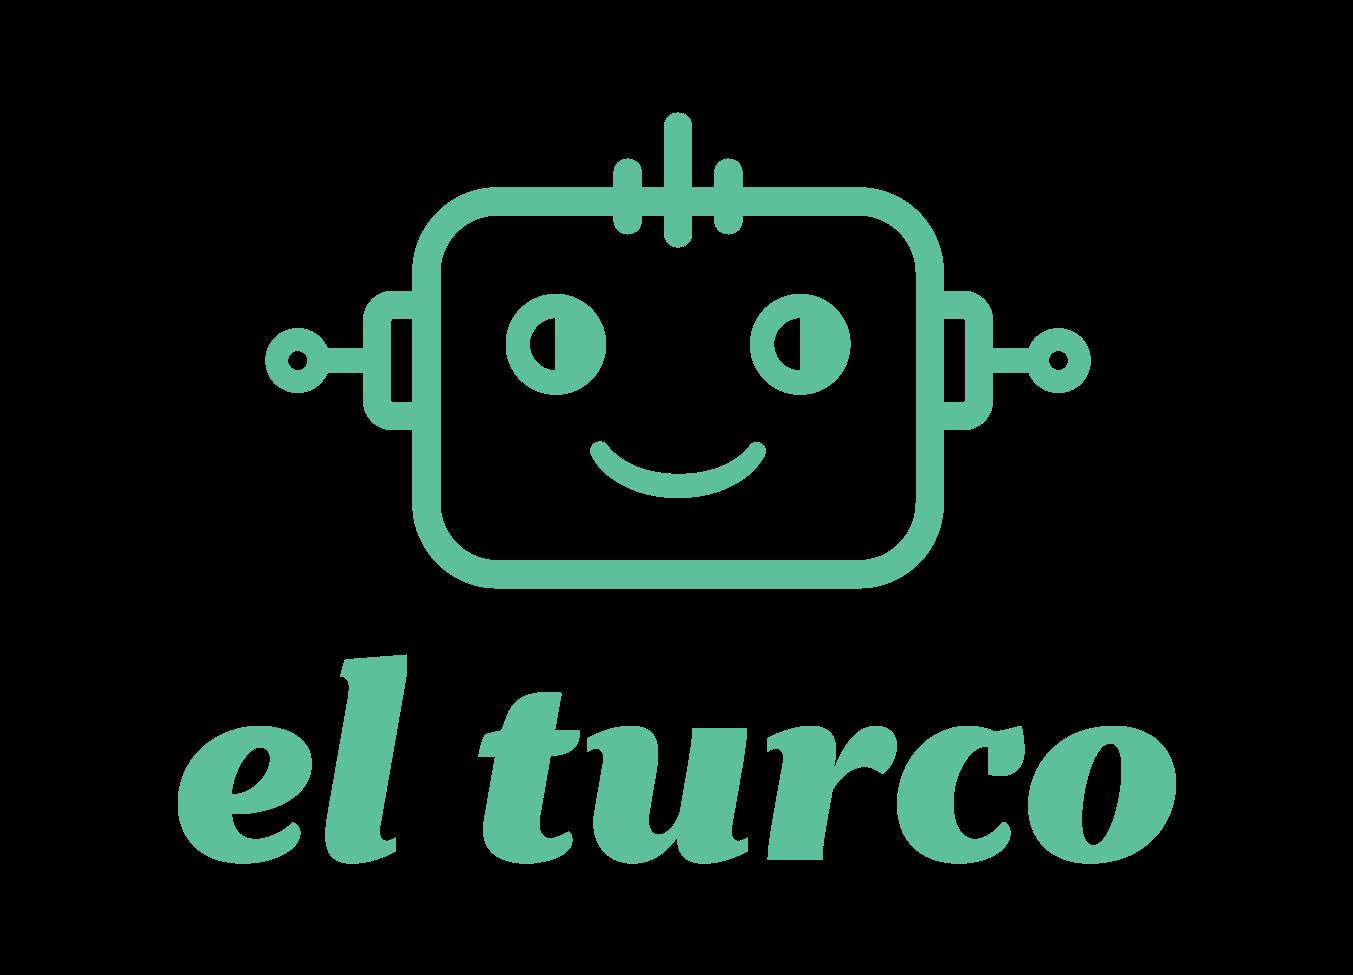 eltu-tr-20 logo